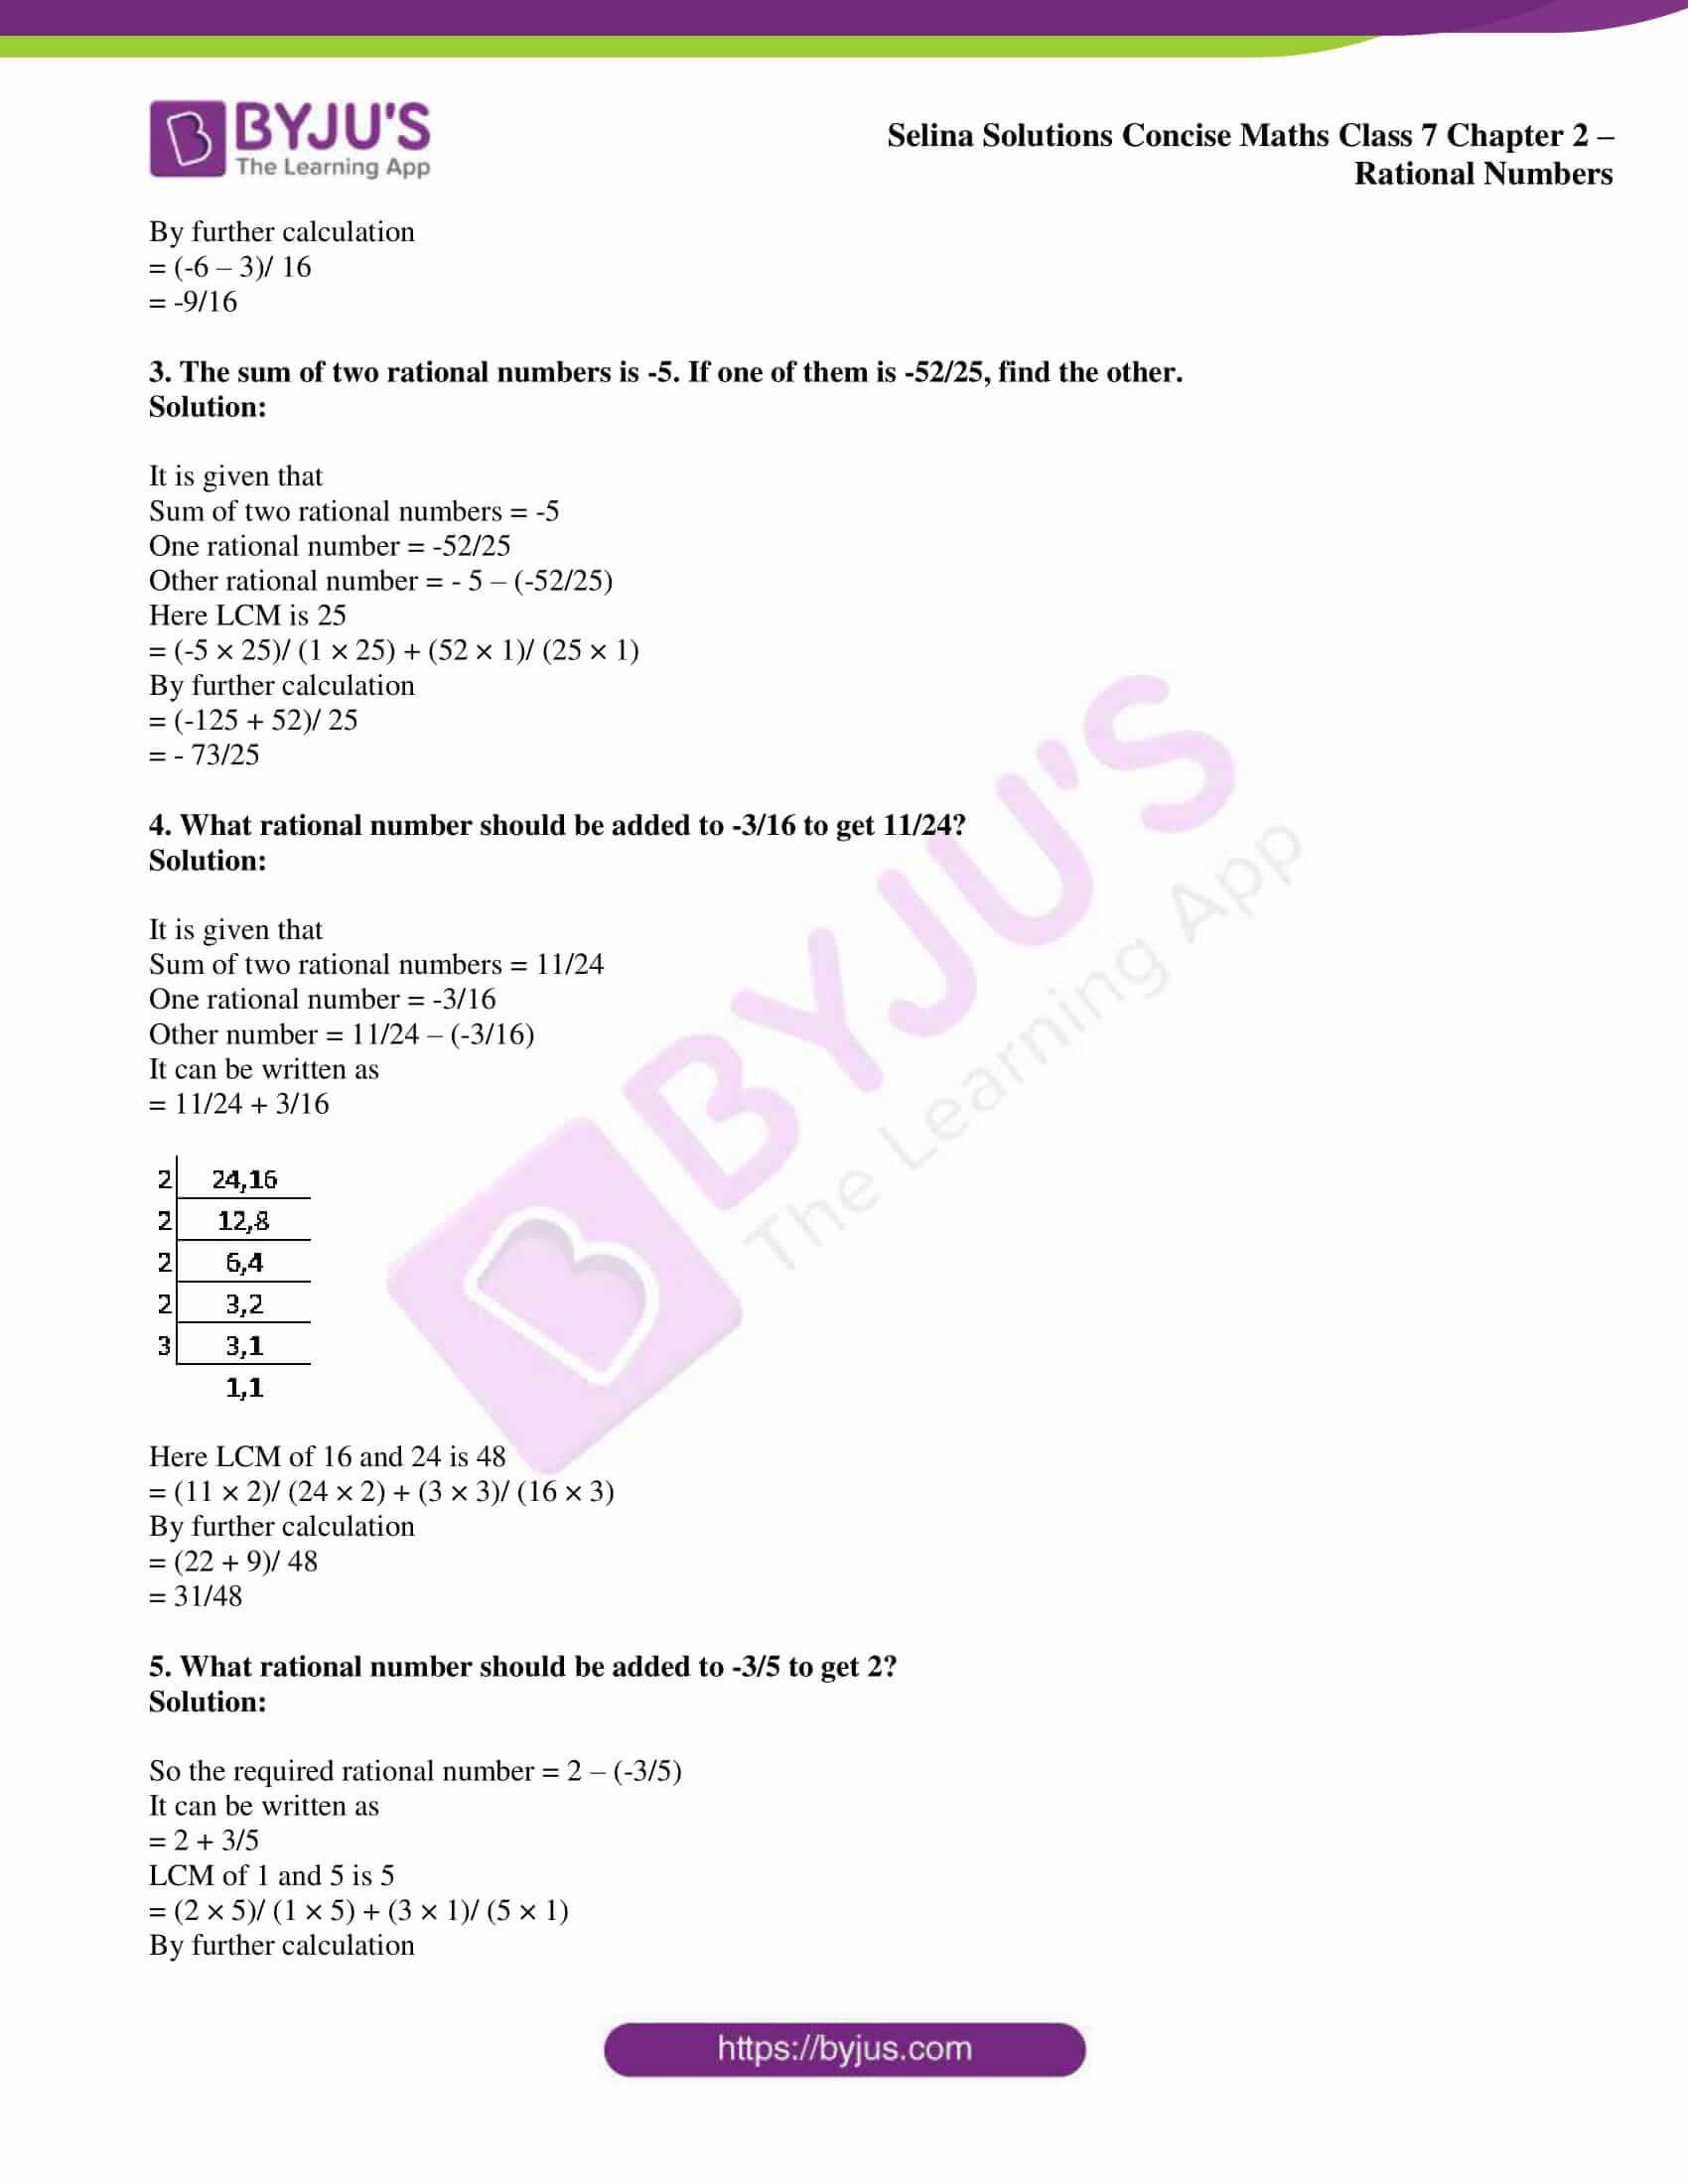 selina sol concise maths class 7 ch2 ex 2e 5